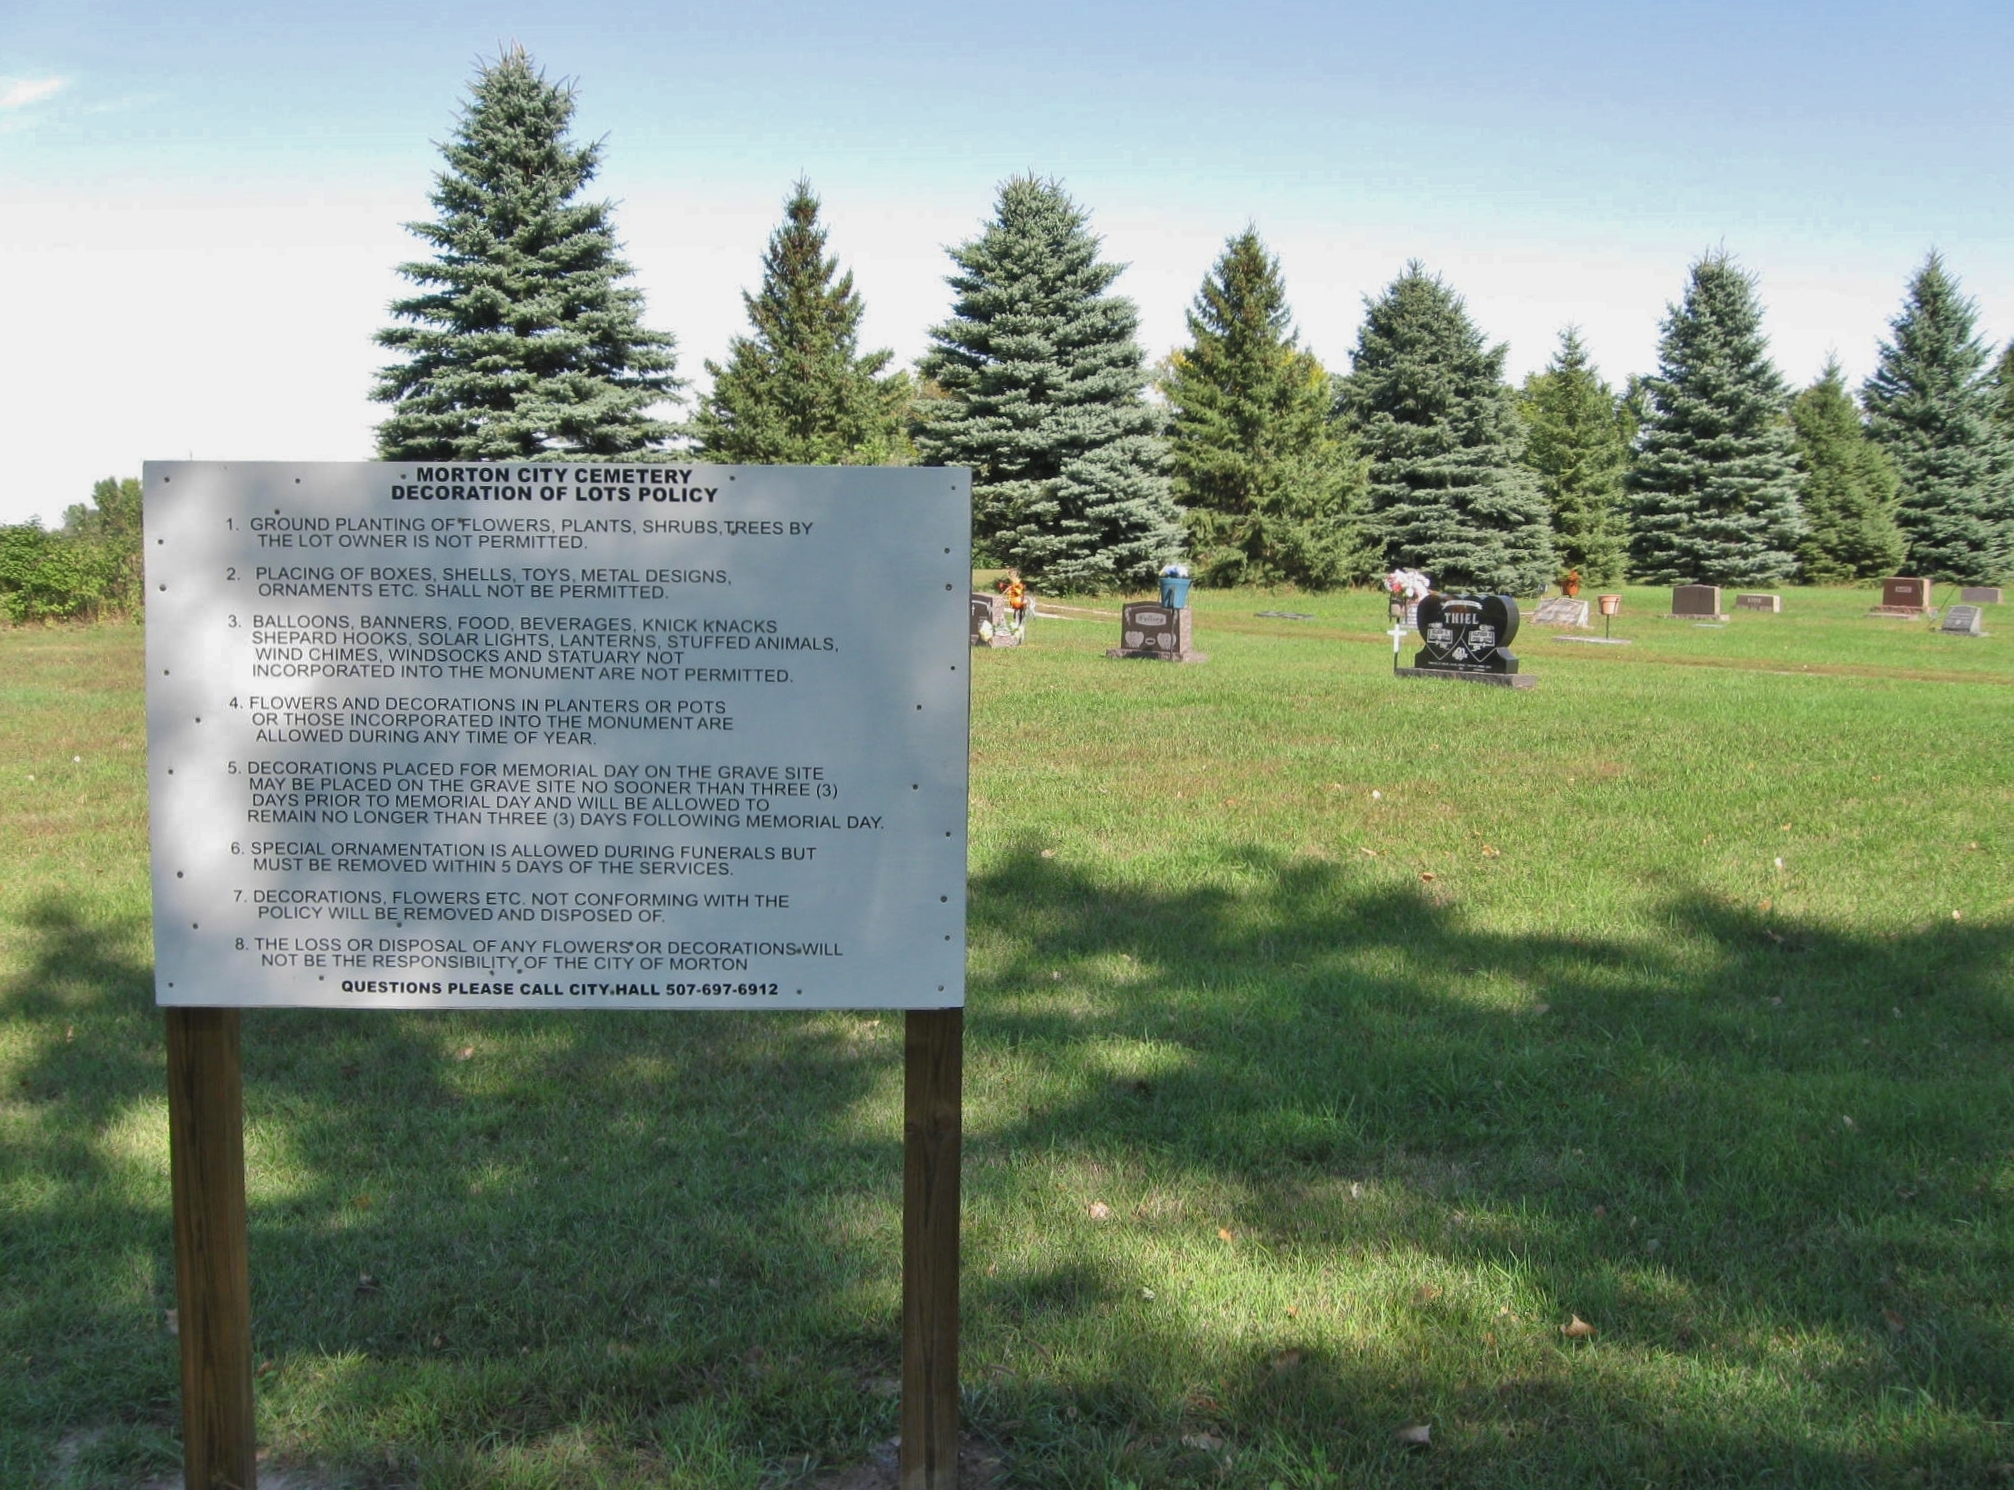 Morton City Cemetery